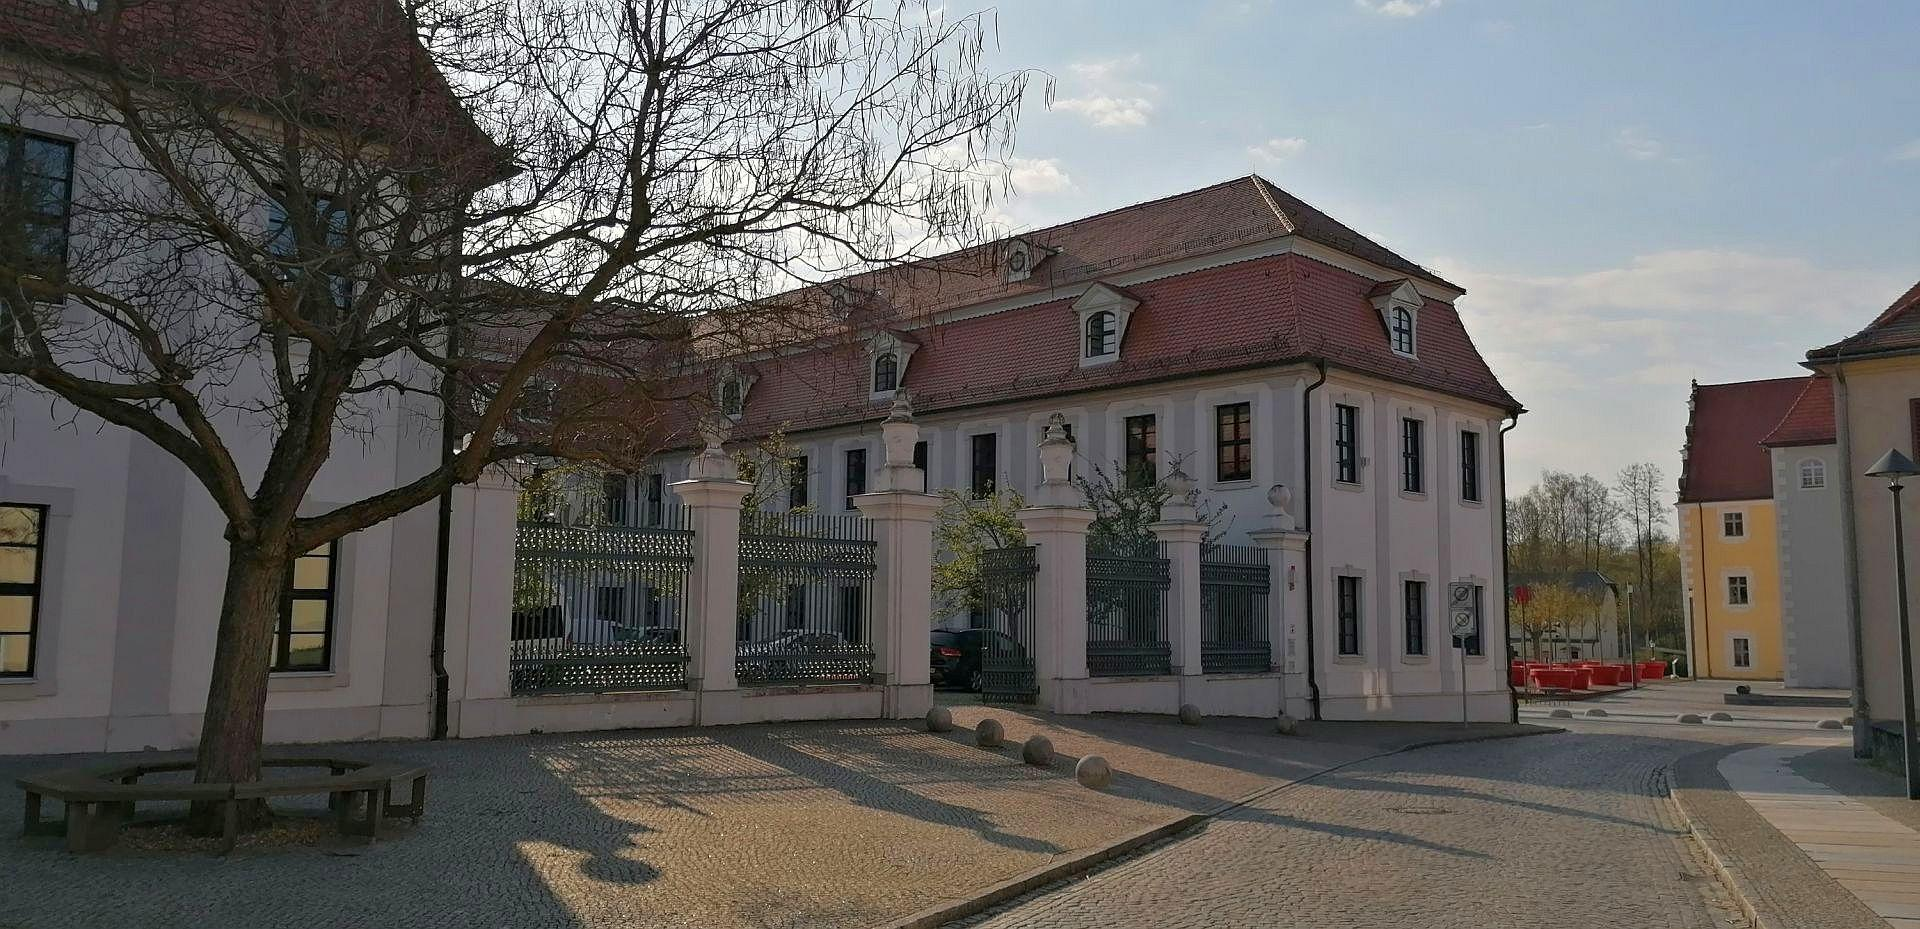 2021-05_Siehdichum_Staendehaus